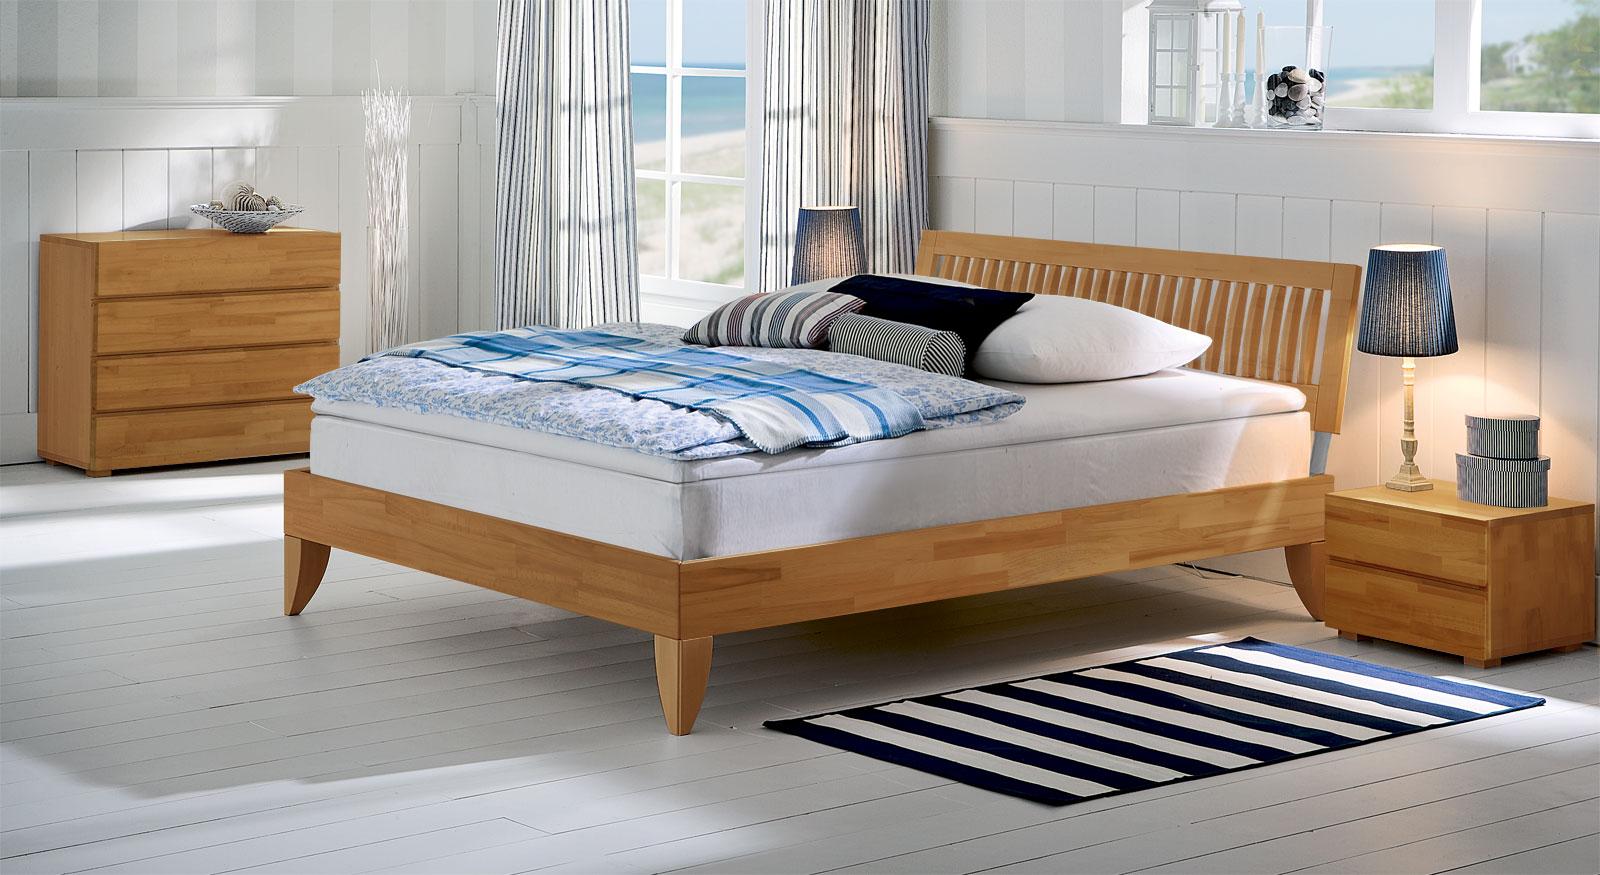 boxspringbett aus massivholz mit sprossen kopfteil nias. Black Bedroom Furniture Sets. Home Design Ideas